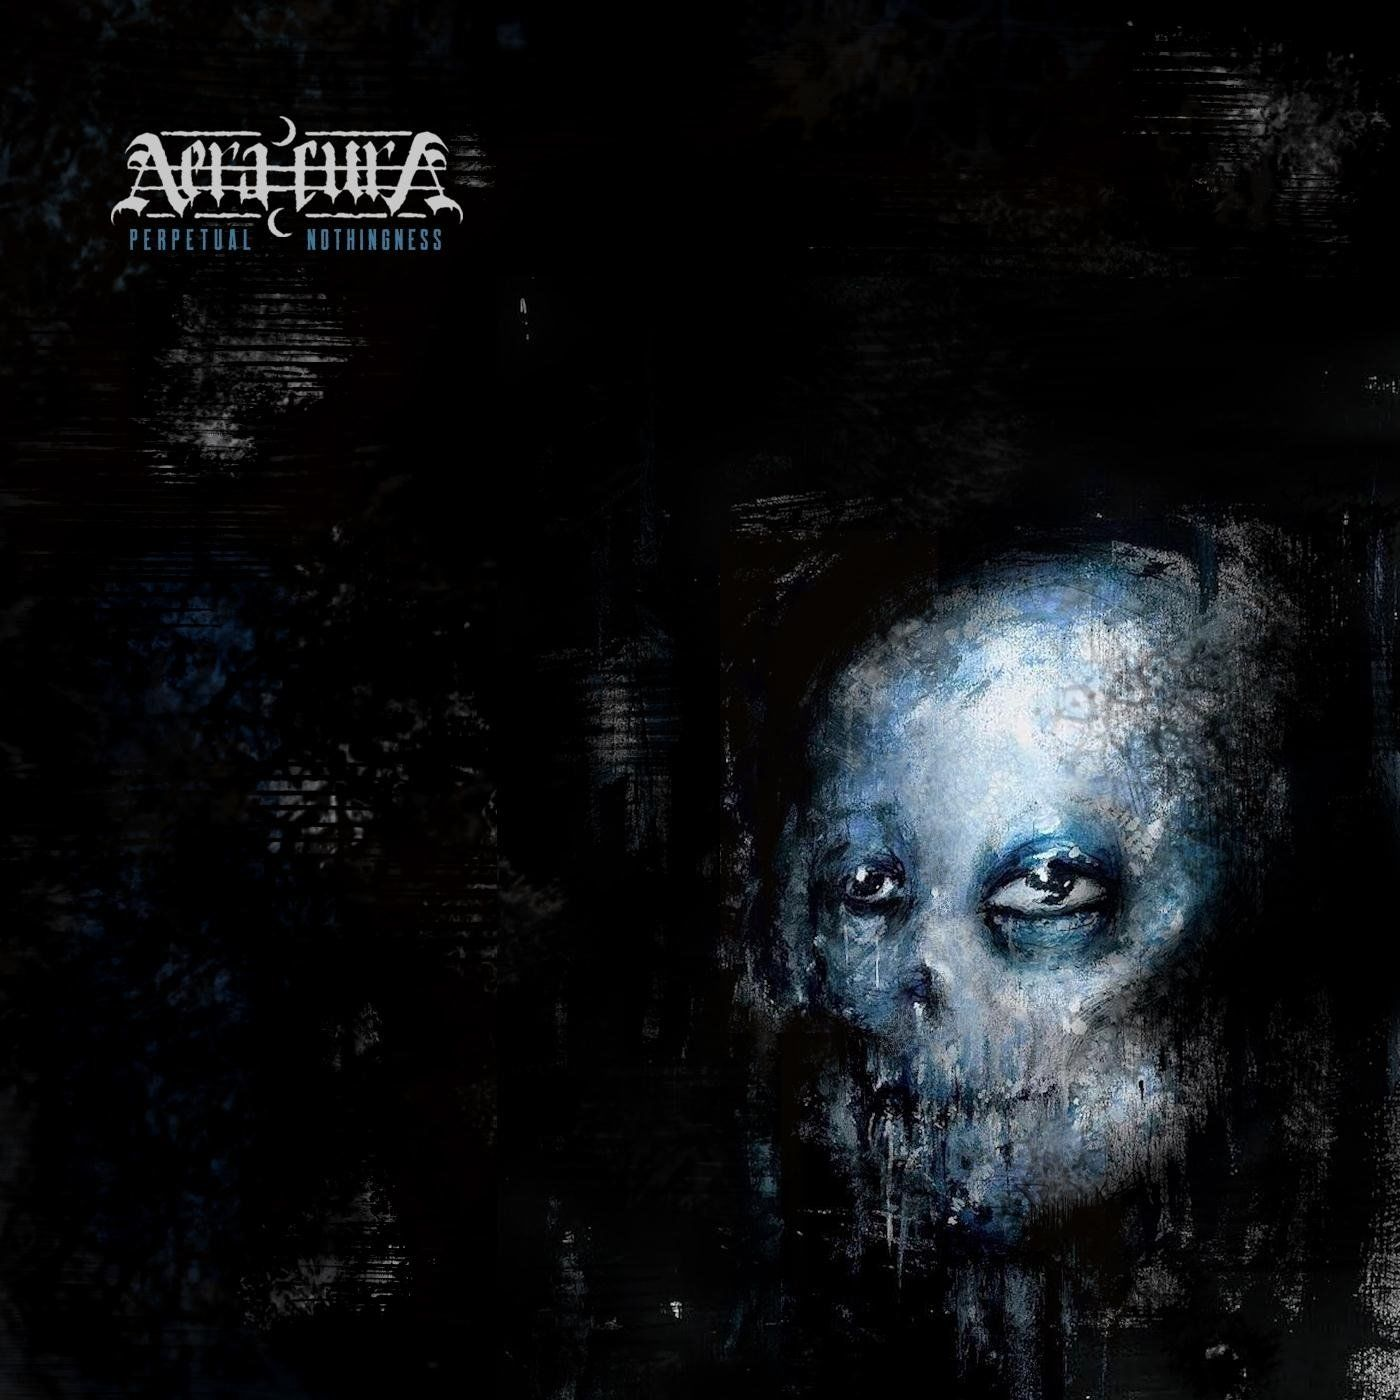 Aera Cura - Perpetual Nothingness [EP] (2020)